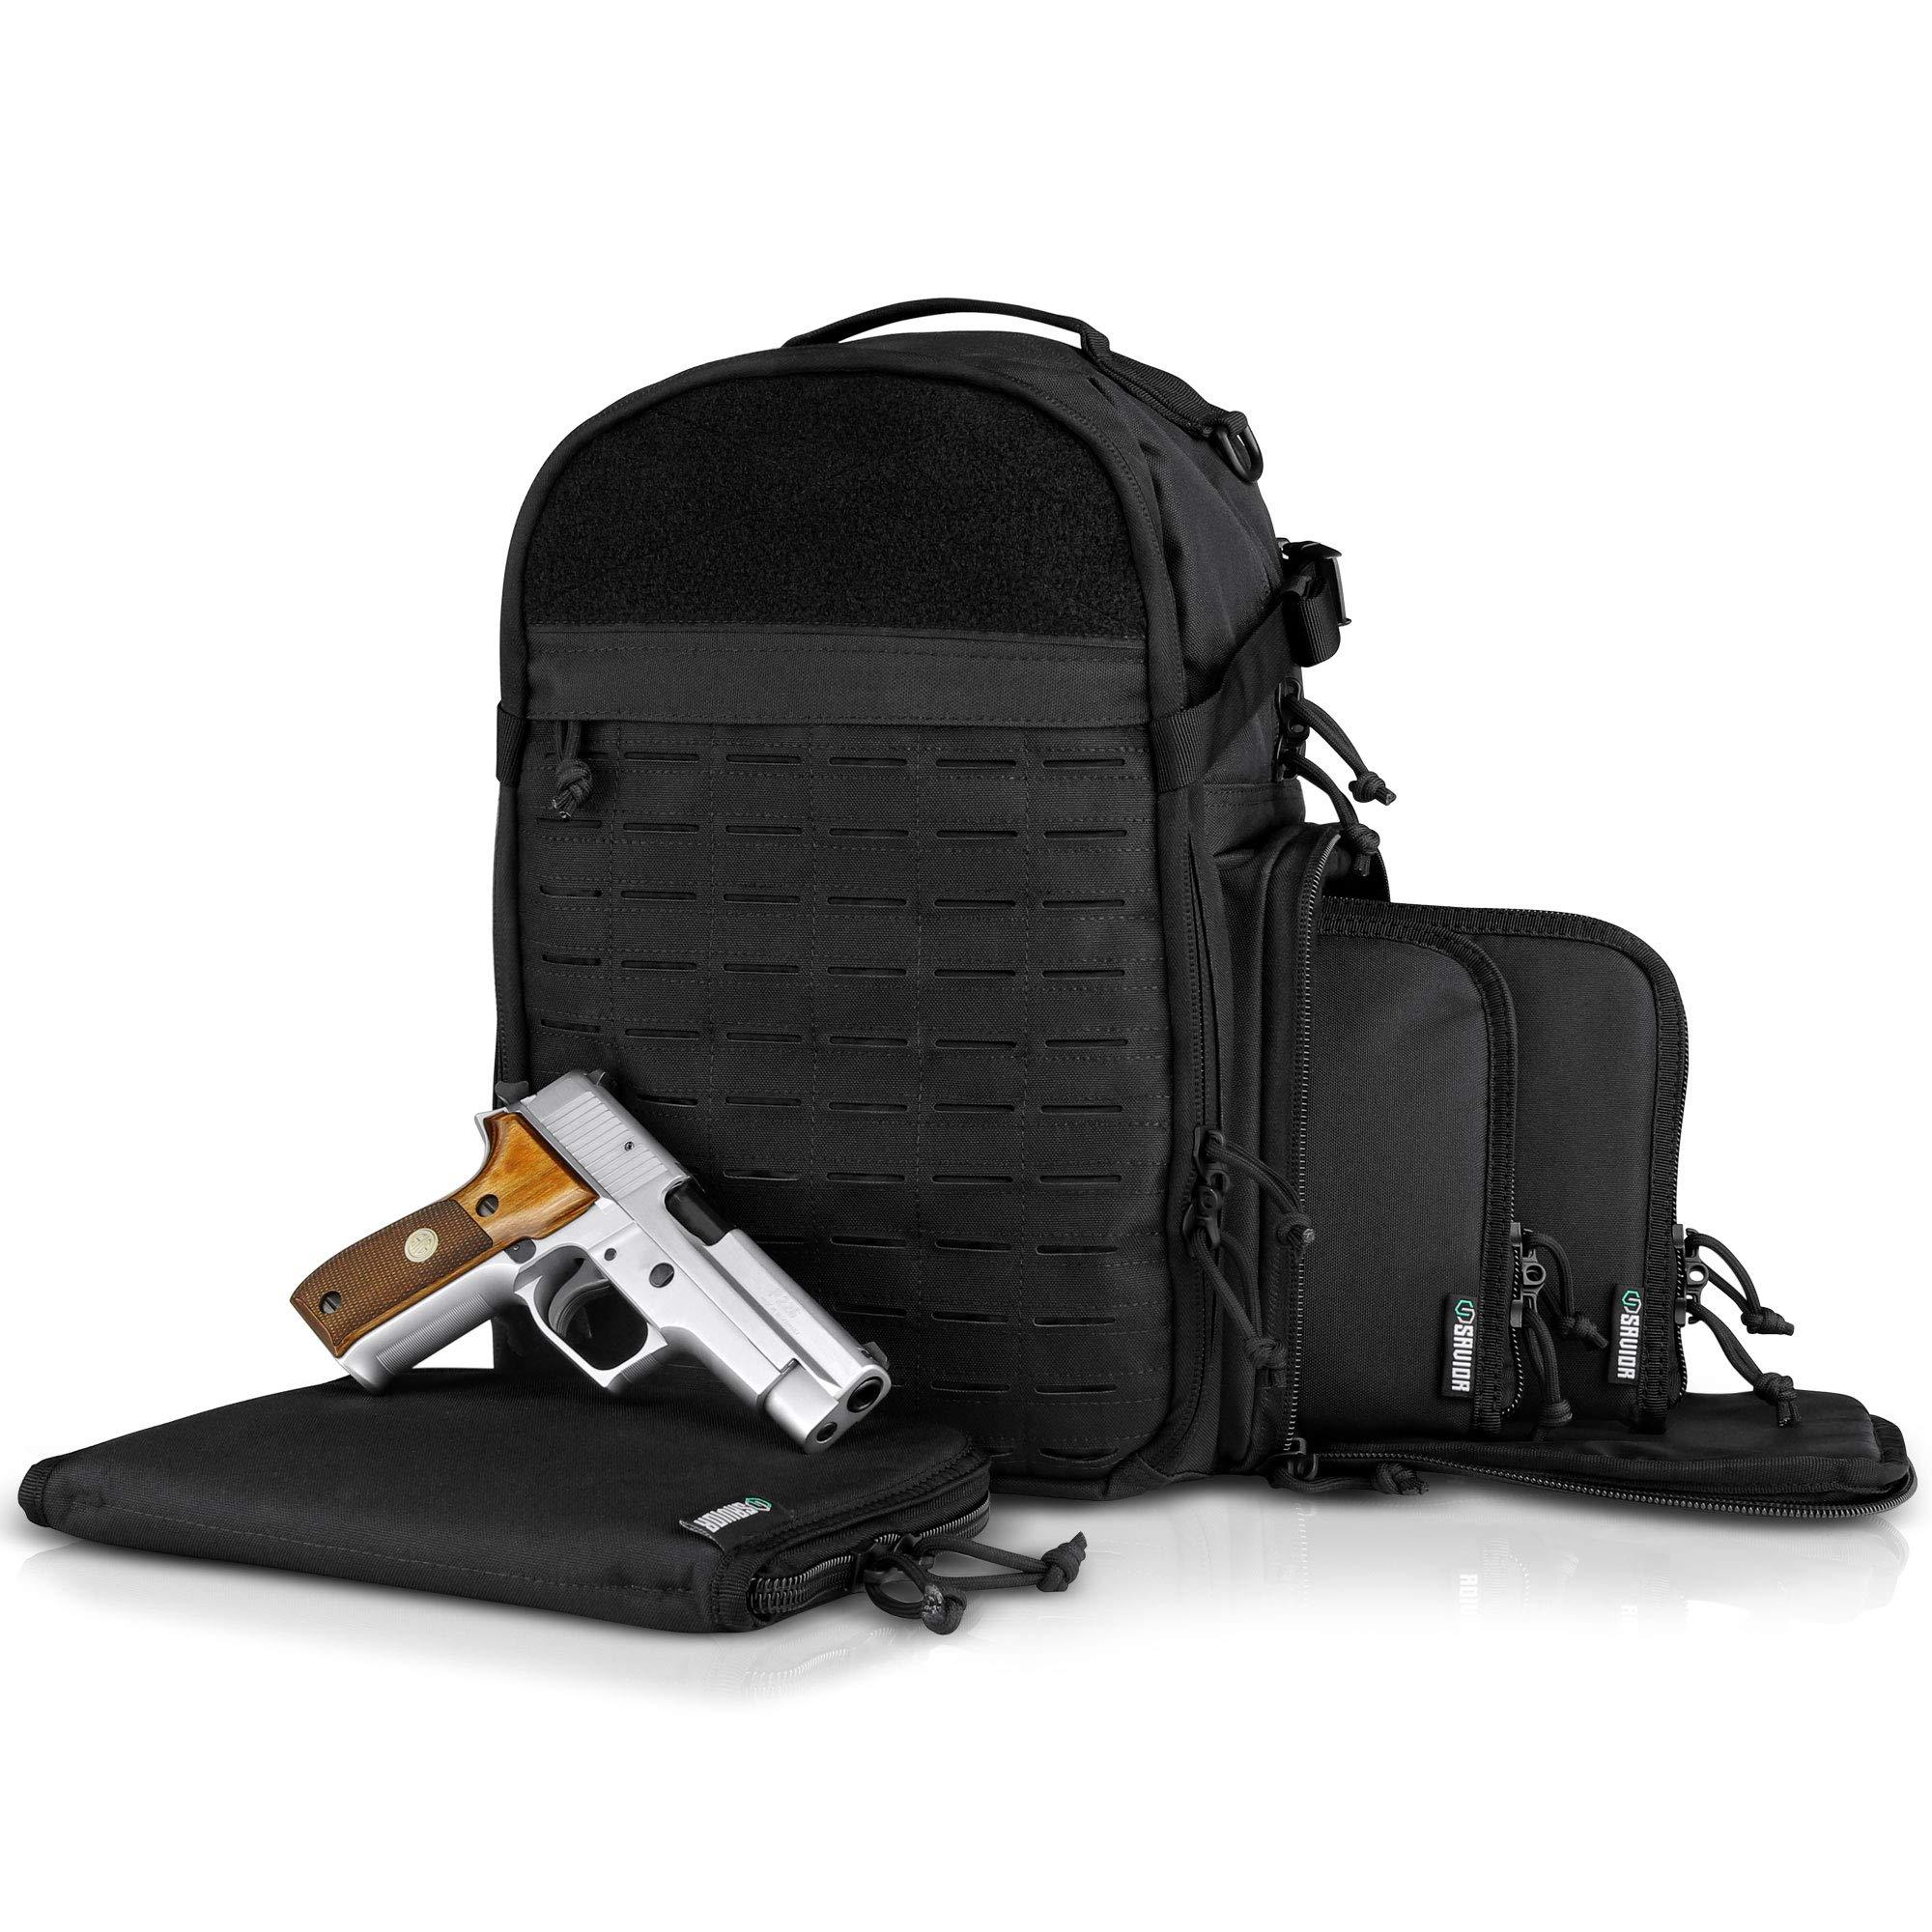 Savior Equipment Mobile Arsenal SEMA 19L Tactical Range Bag Backpack Pistol Case by Savior Equipment